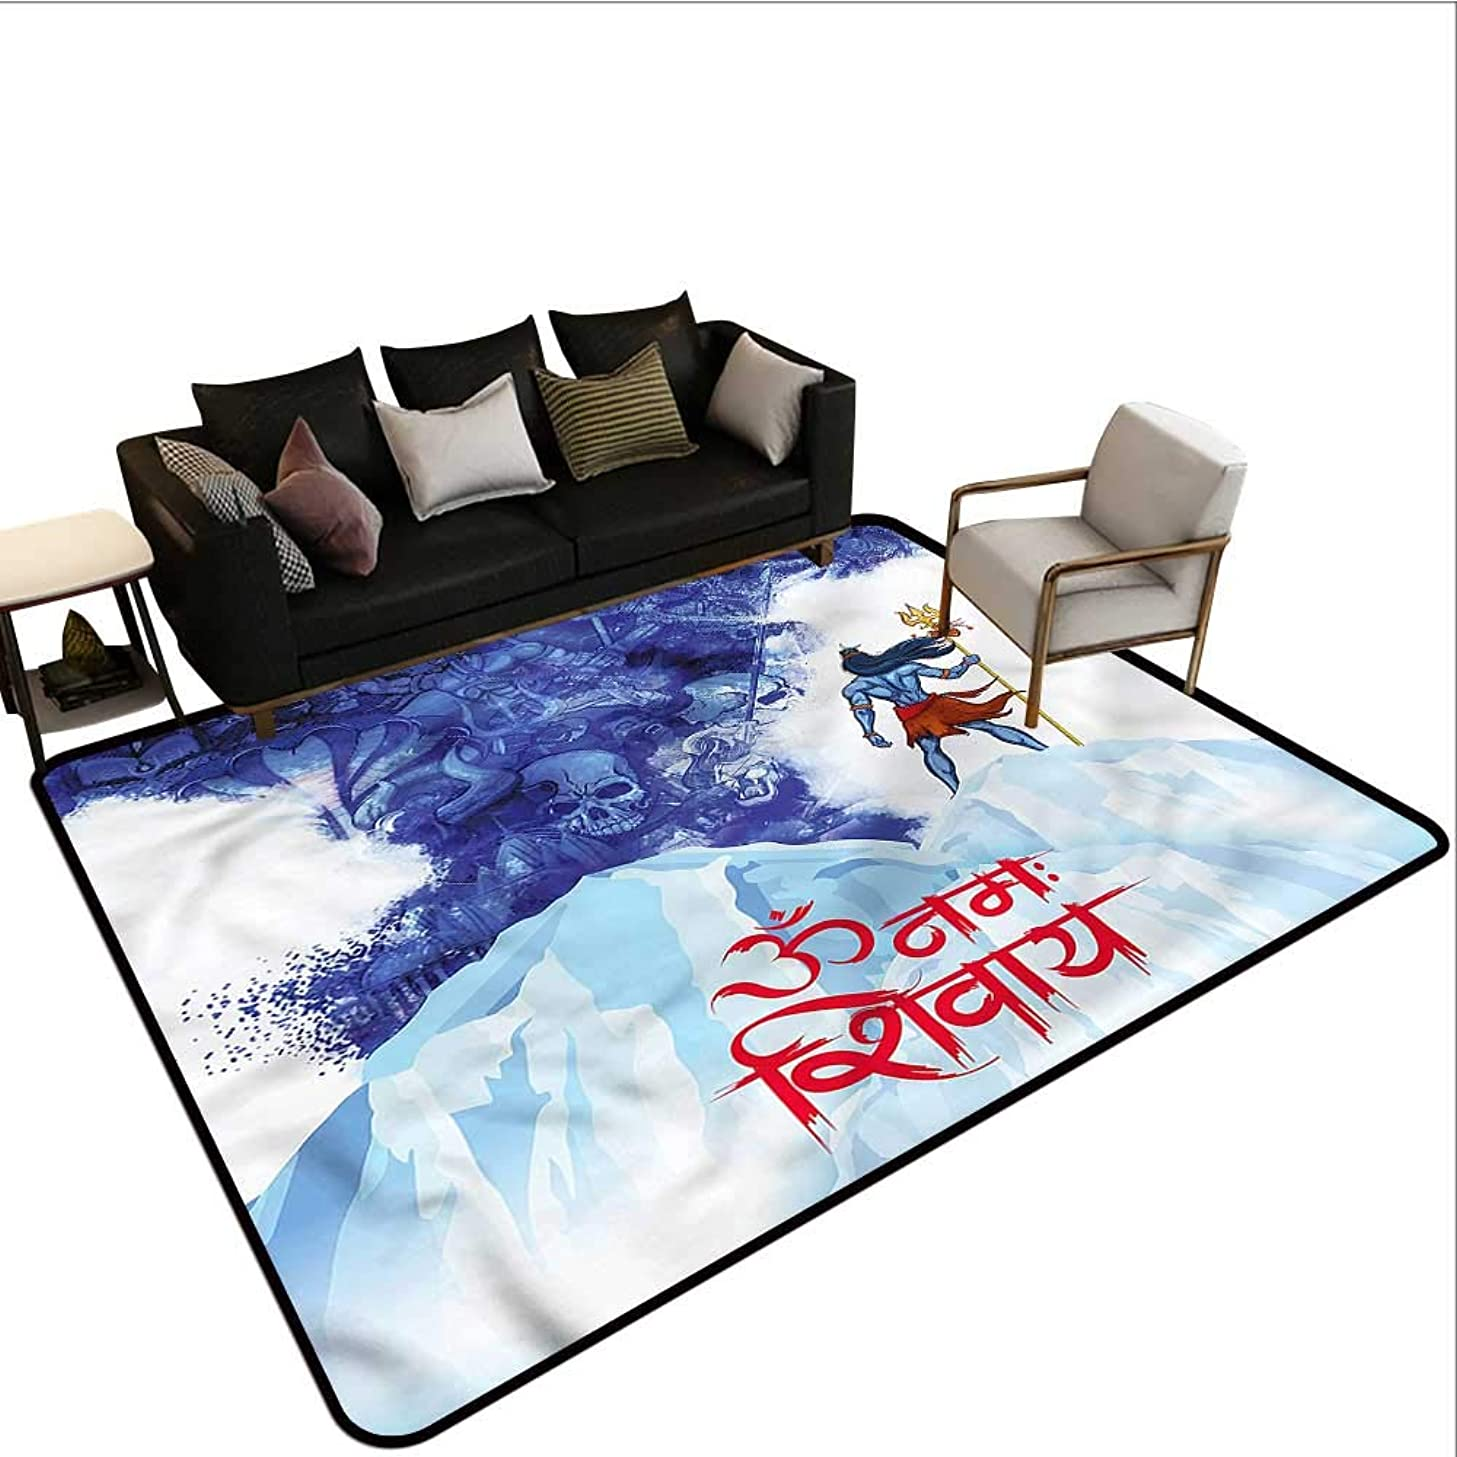 Ethnic,Large Floor Mats for Living Room 48